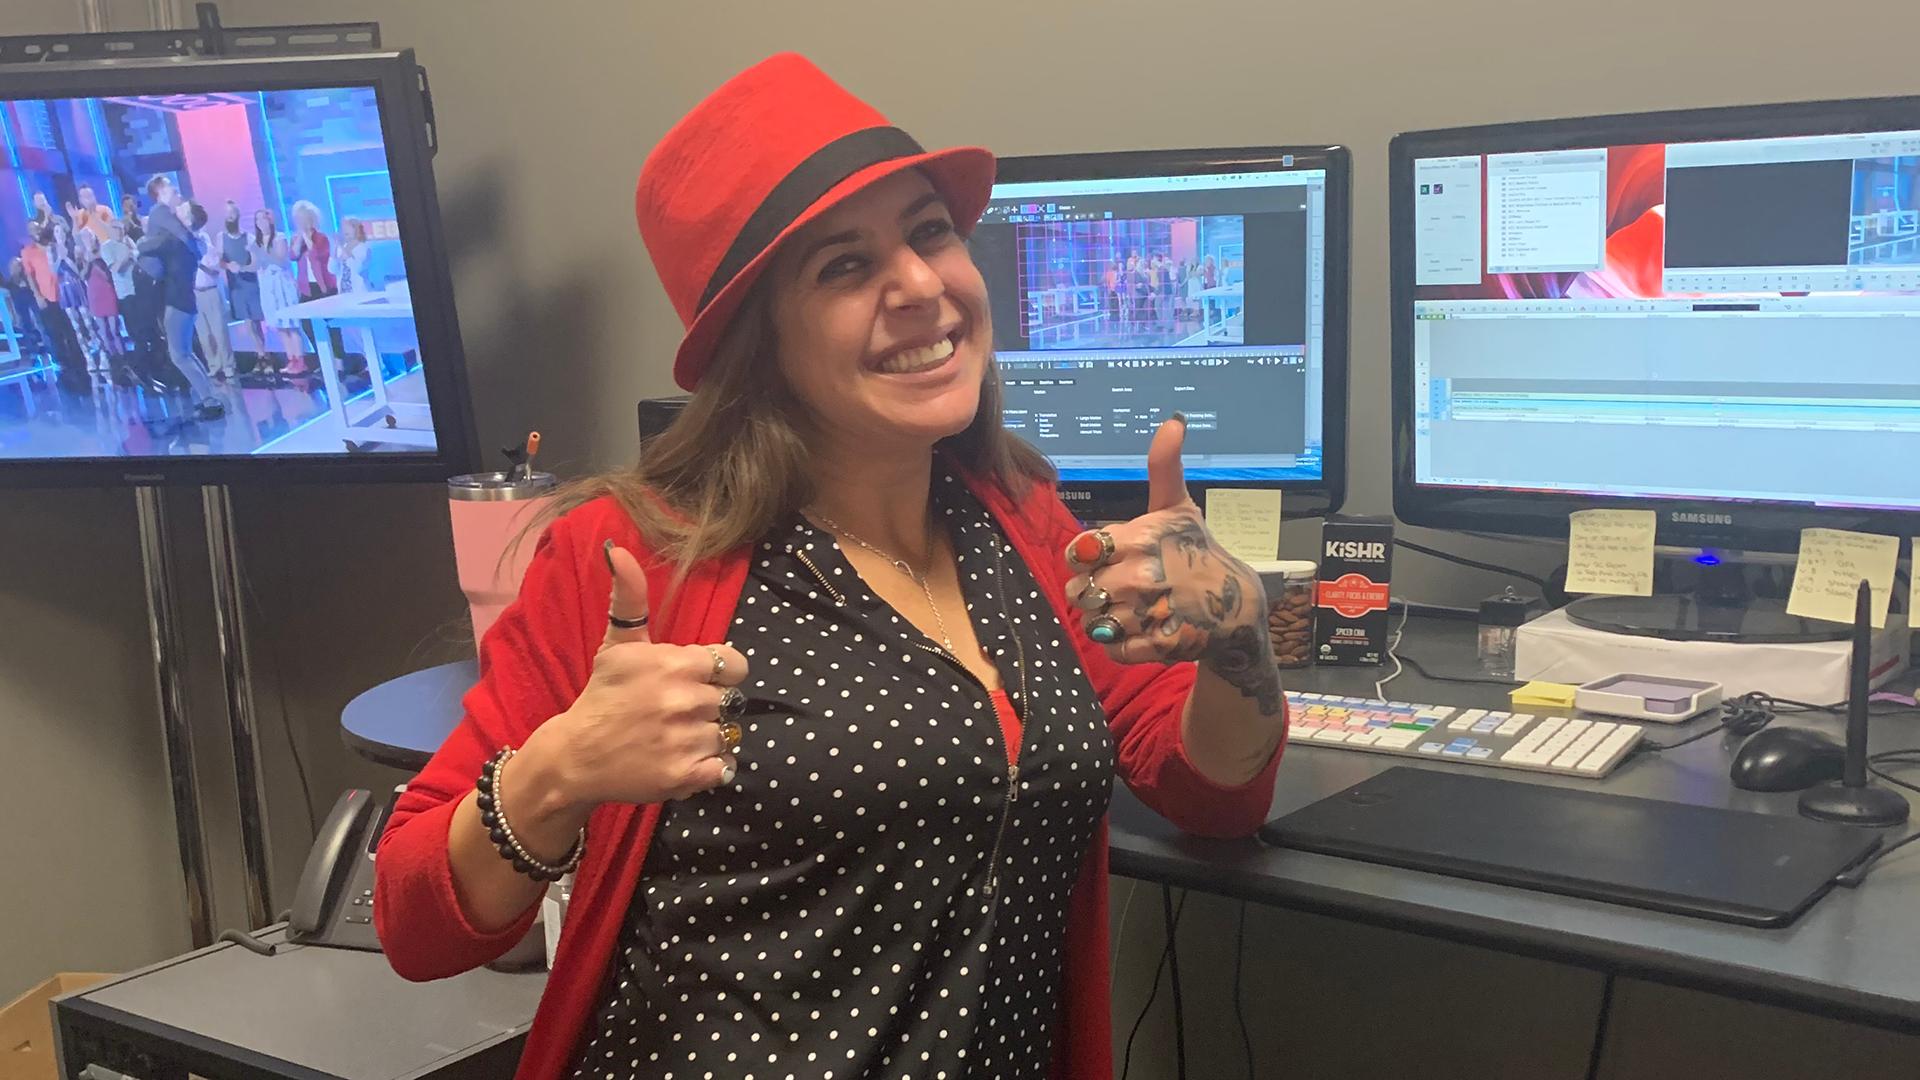 Monica Coonis at her workstation